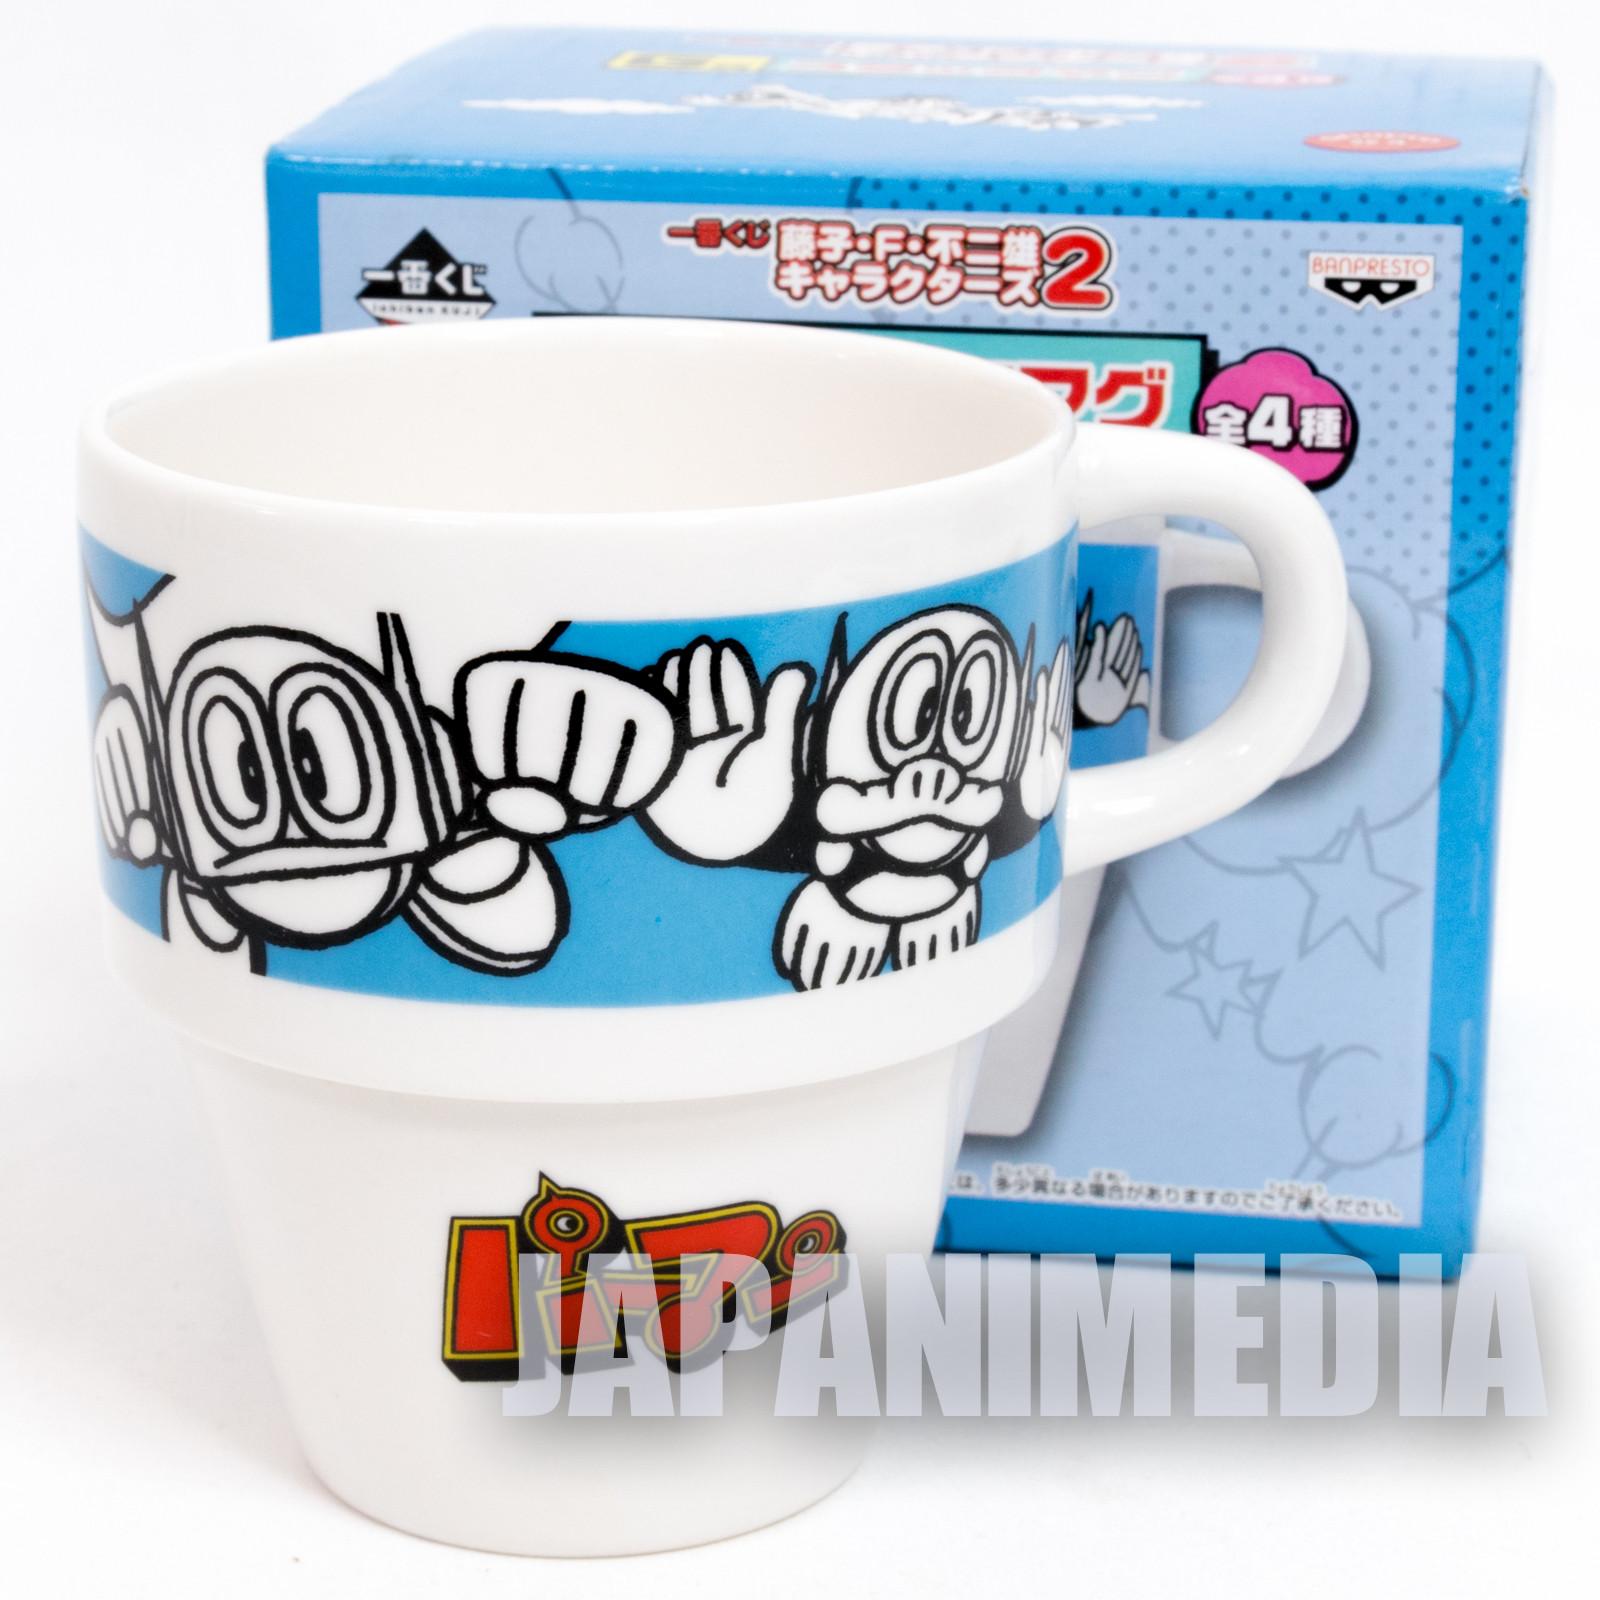 Fujiko F Fujio Characters Stacking Mug Cup Perman JAPAN ANIME MANGA